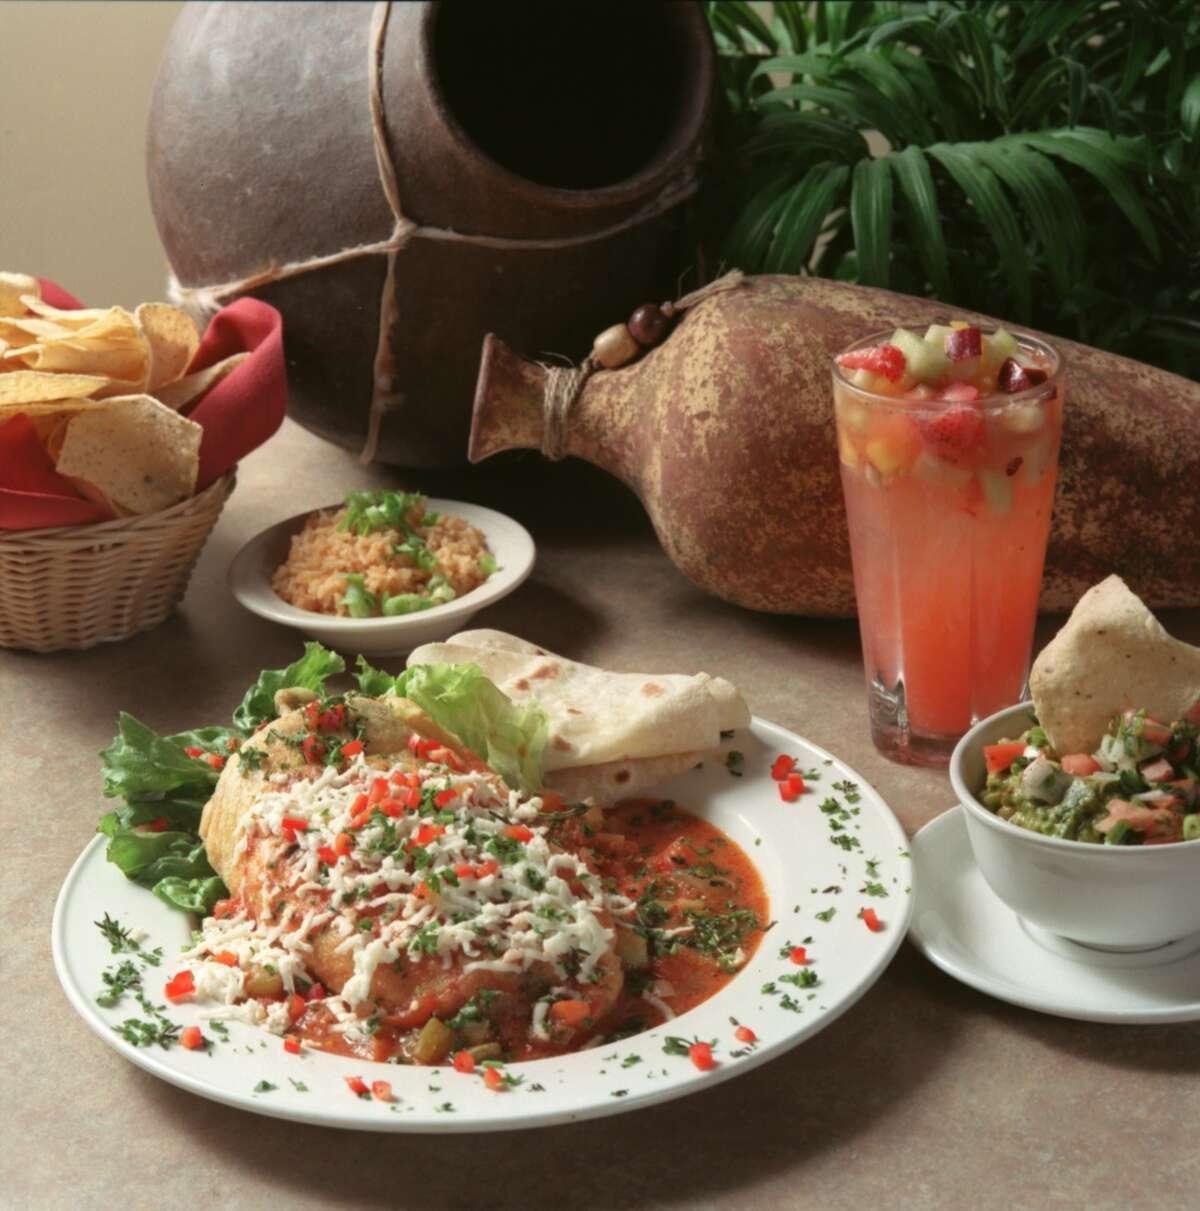 Irma's Cuisine: Mexican Dish: chile relleno Entree price: $$ Where: 22 N. Chevert Phone: 713-222-0767 Website: irmasoriginal.com